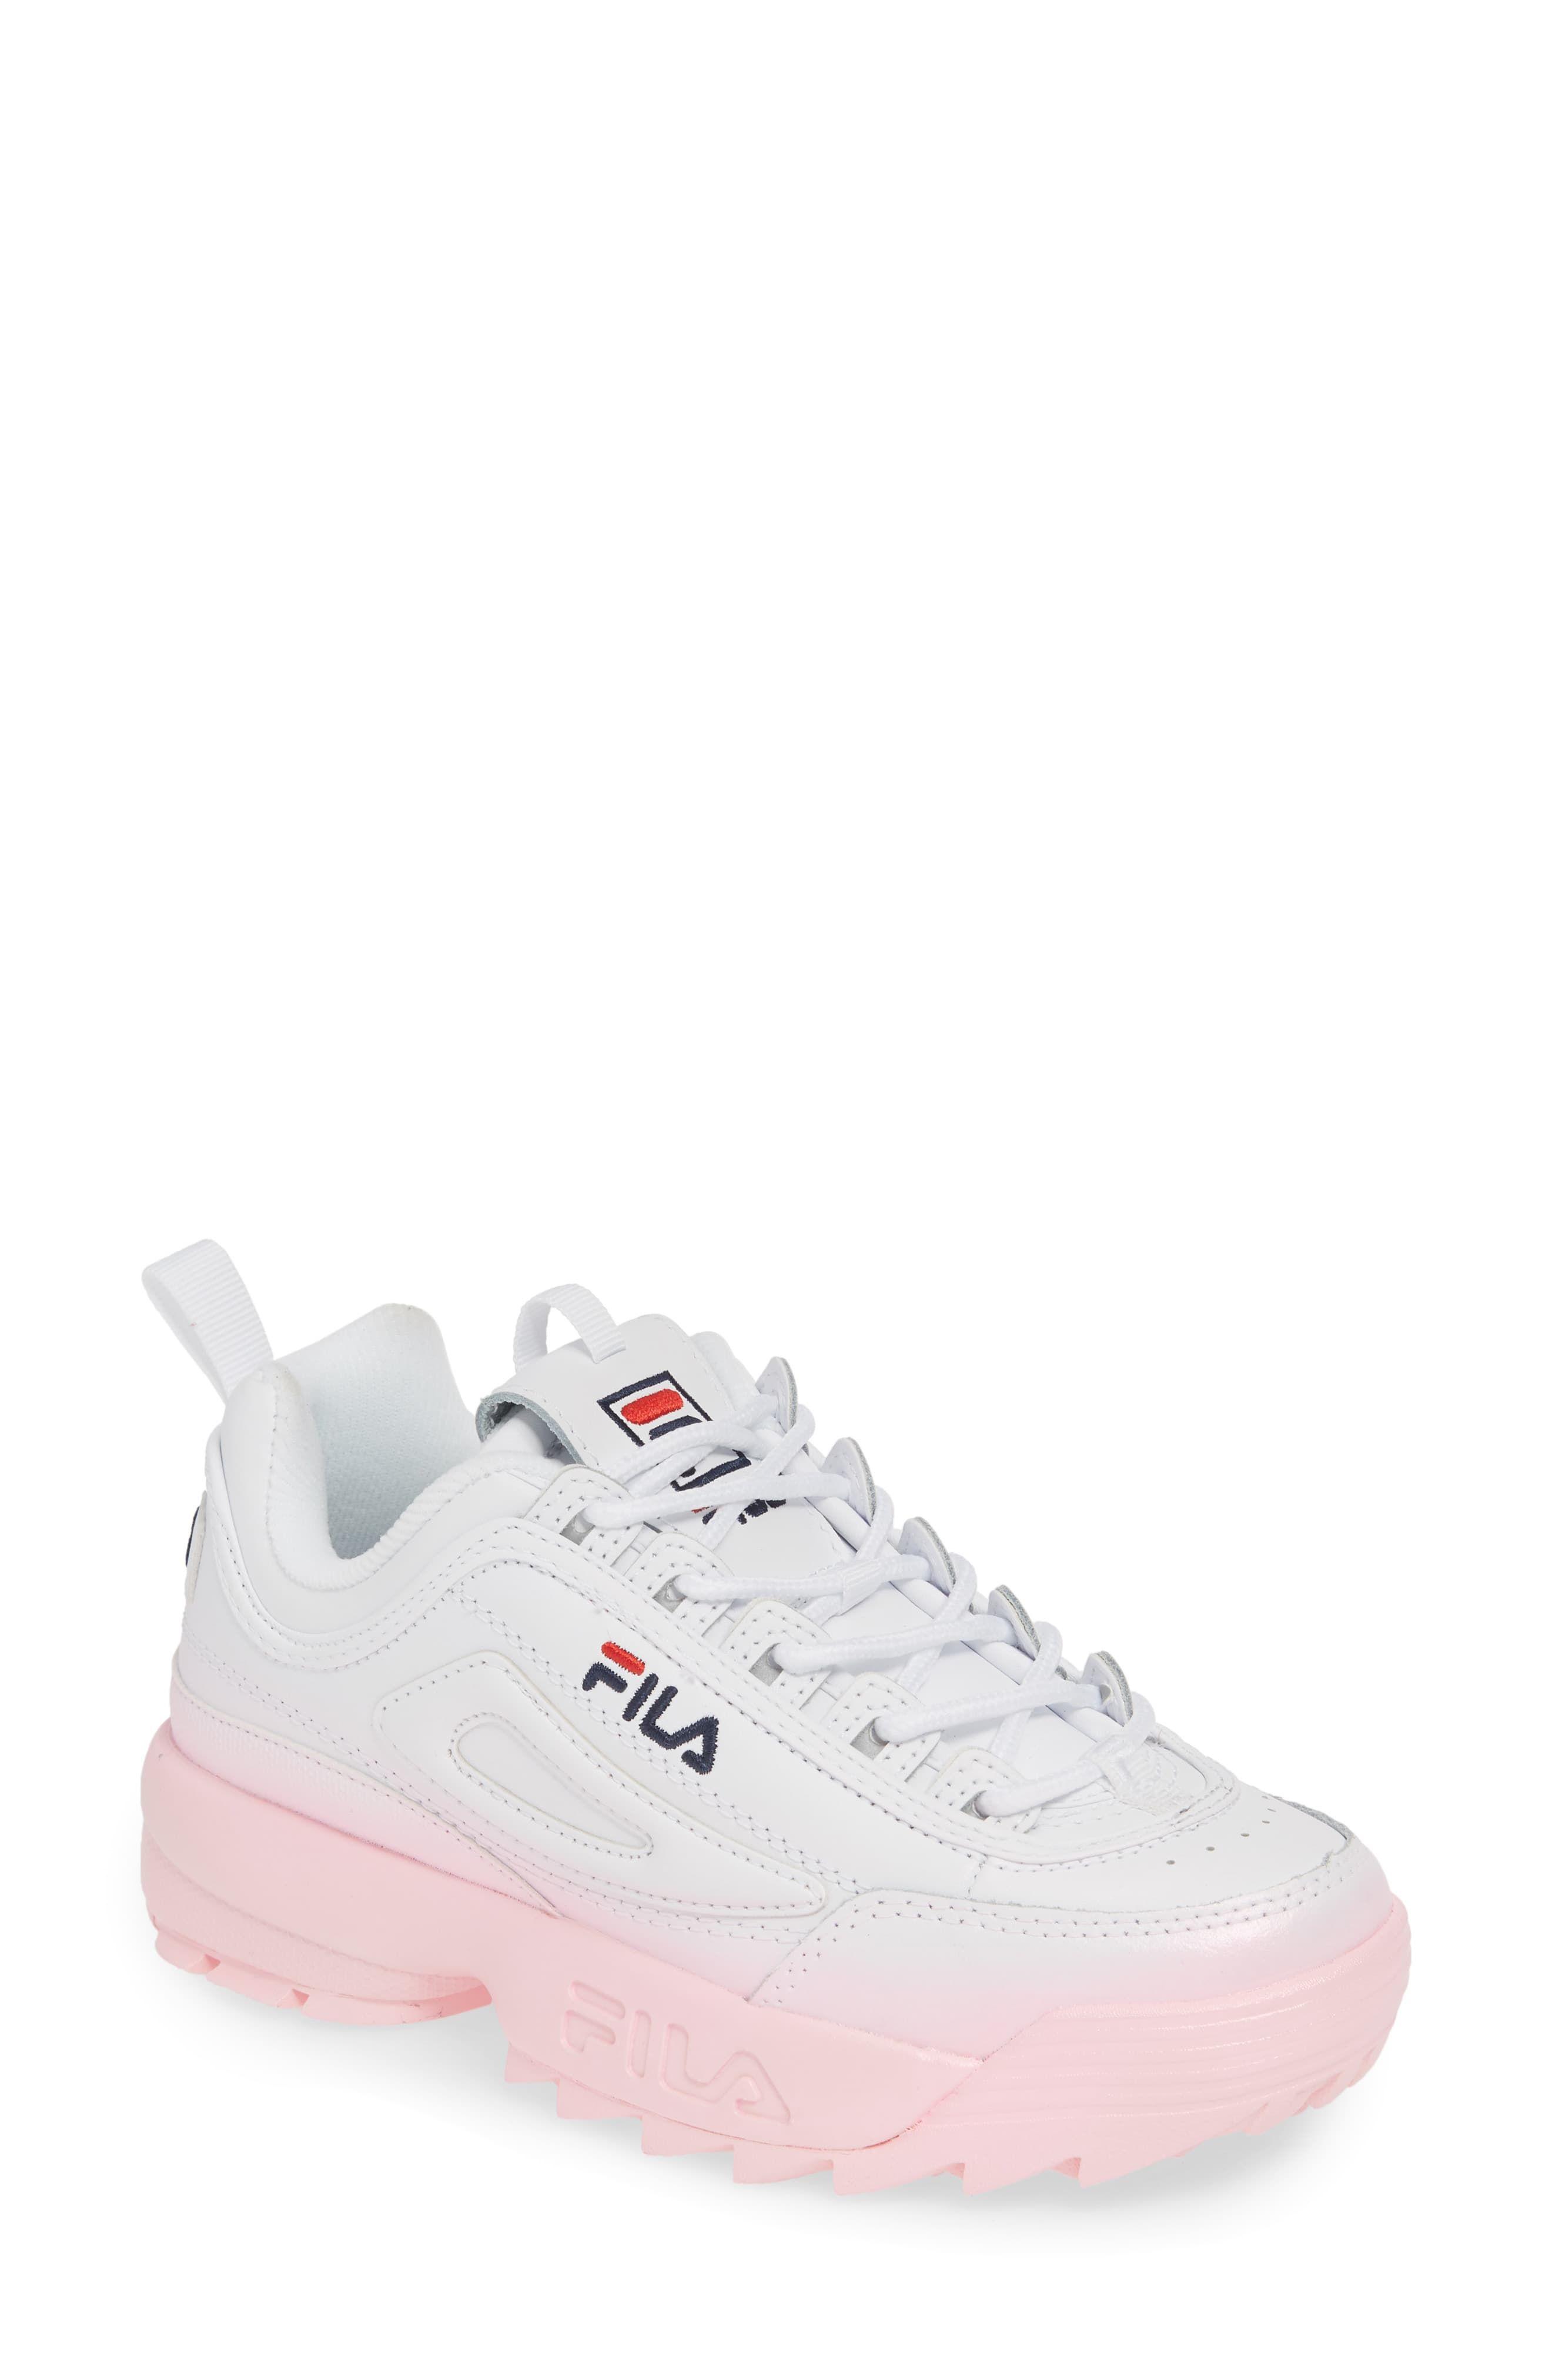 FILA Disruptor 2 Sneaker | Cute sneakers, Nike shoes outfits